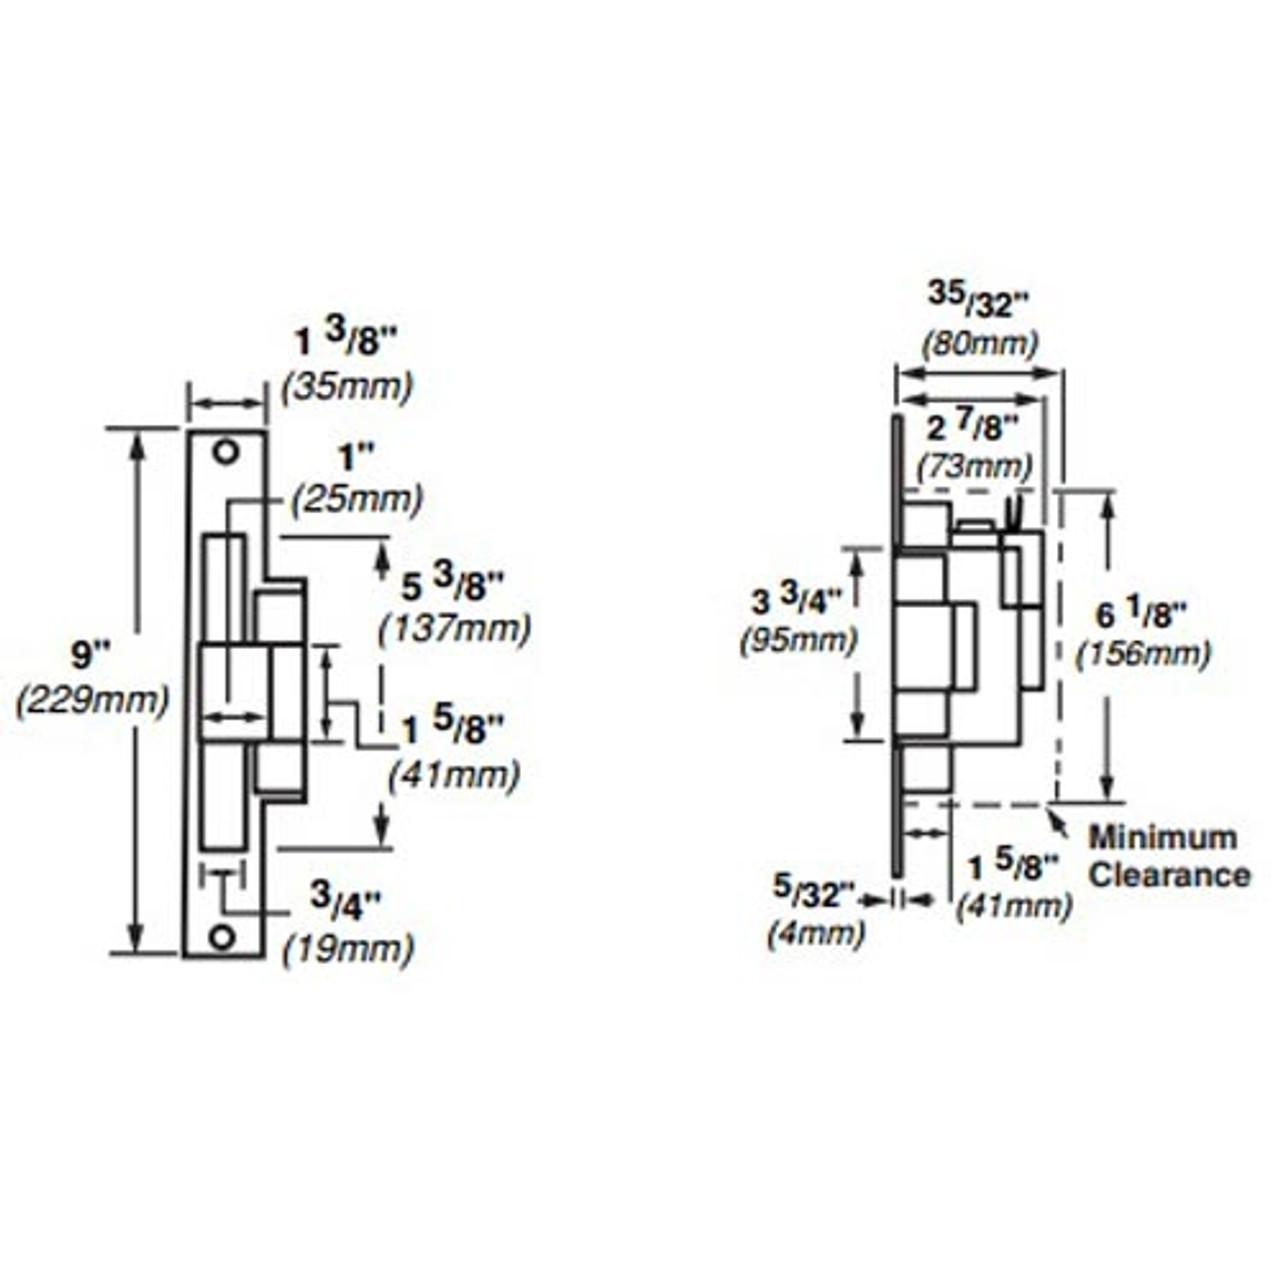 6216-FS-DS-LC-12VDC-US3 Von Duprin Electric Strike for Mortise Locksets in Bright Brass Finish